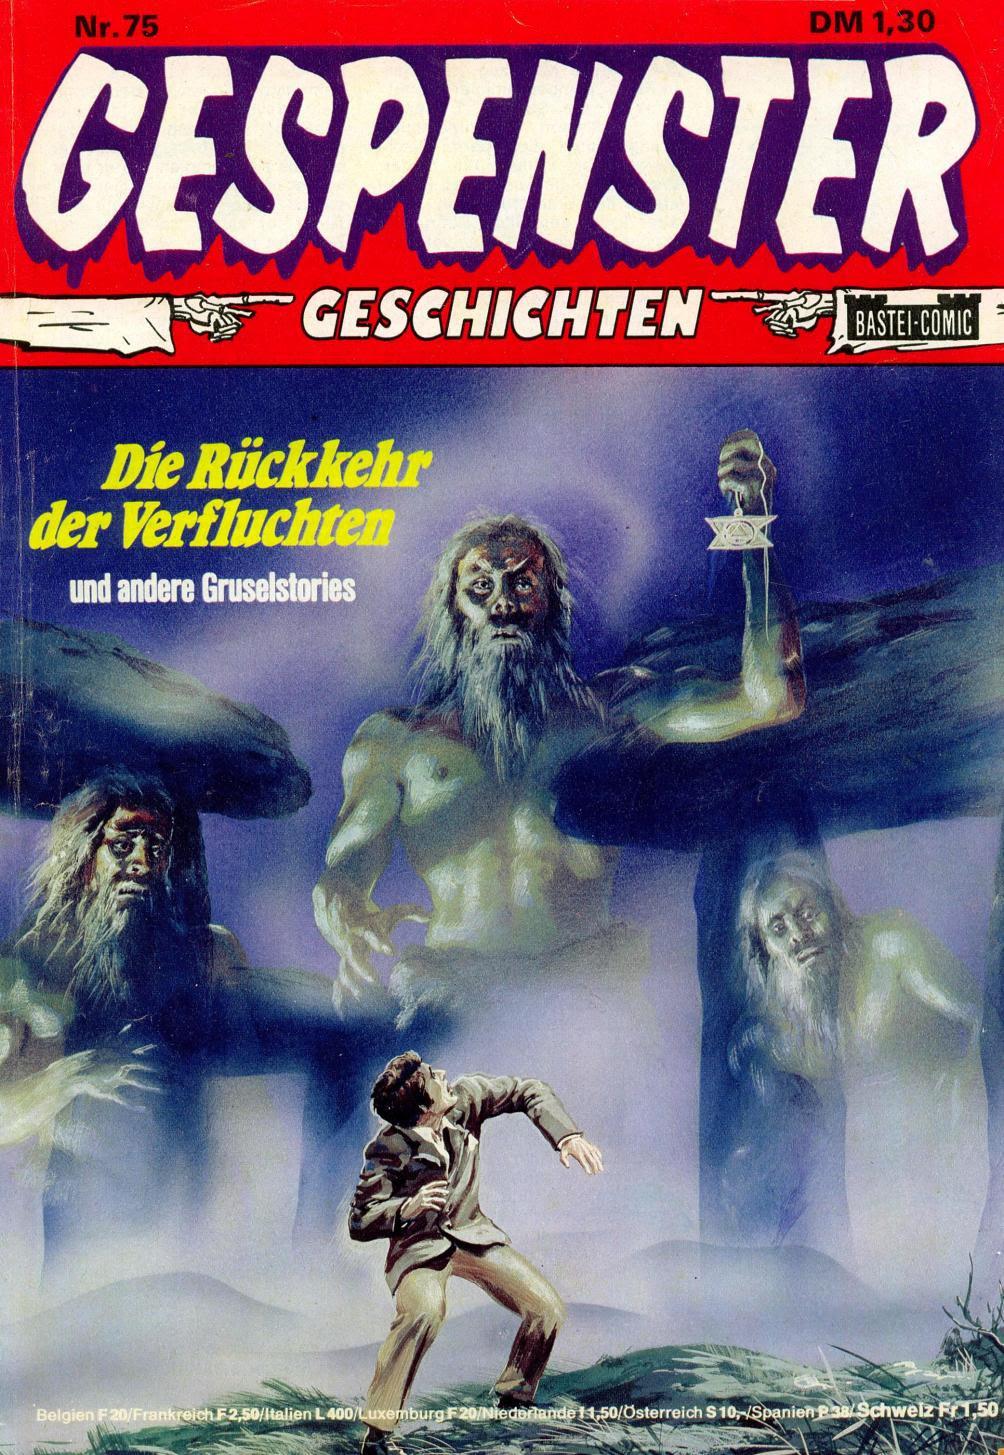 Gespenster Geschichten - 75